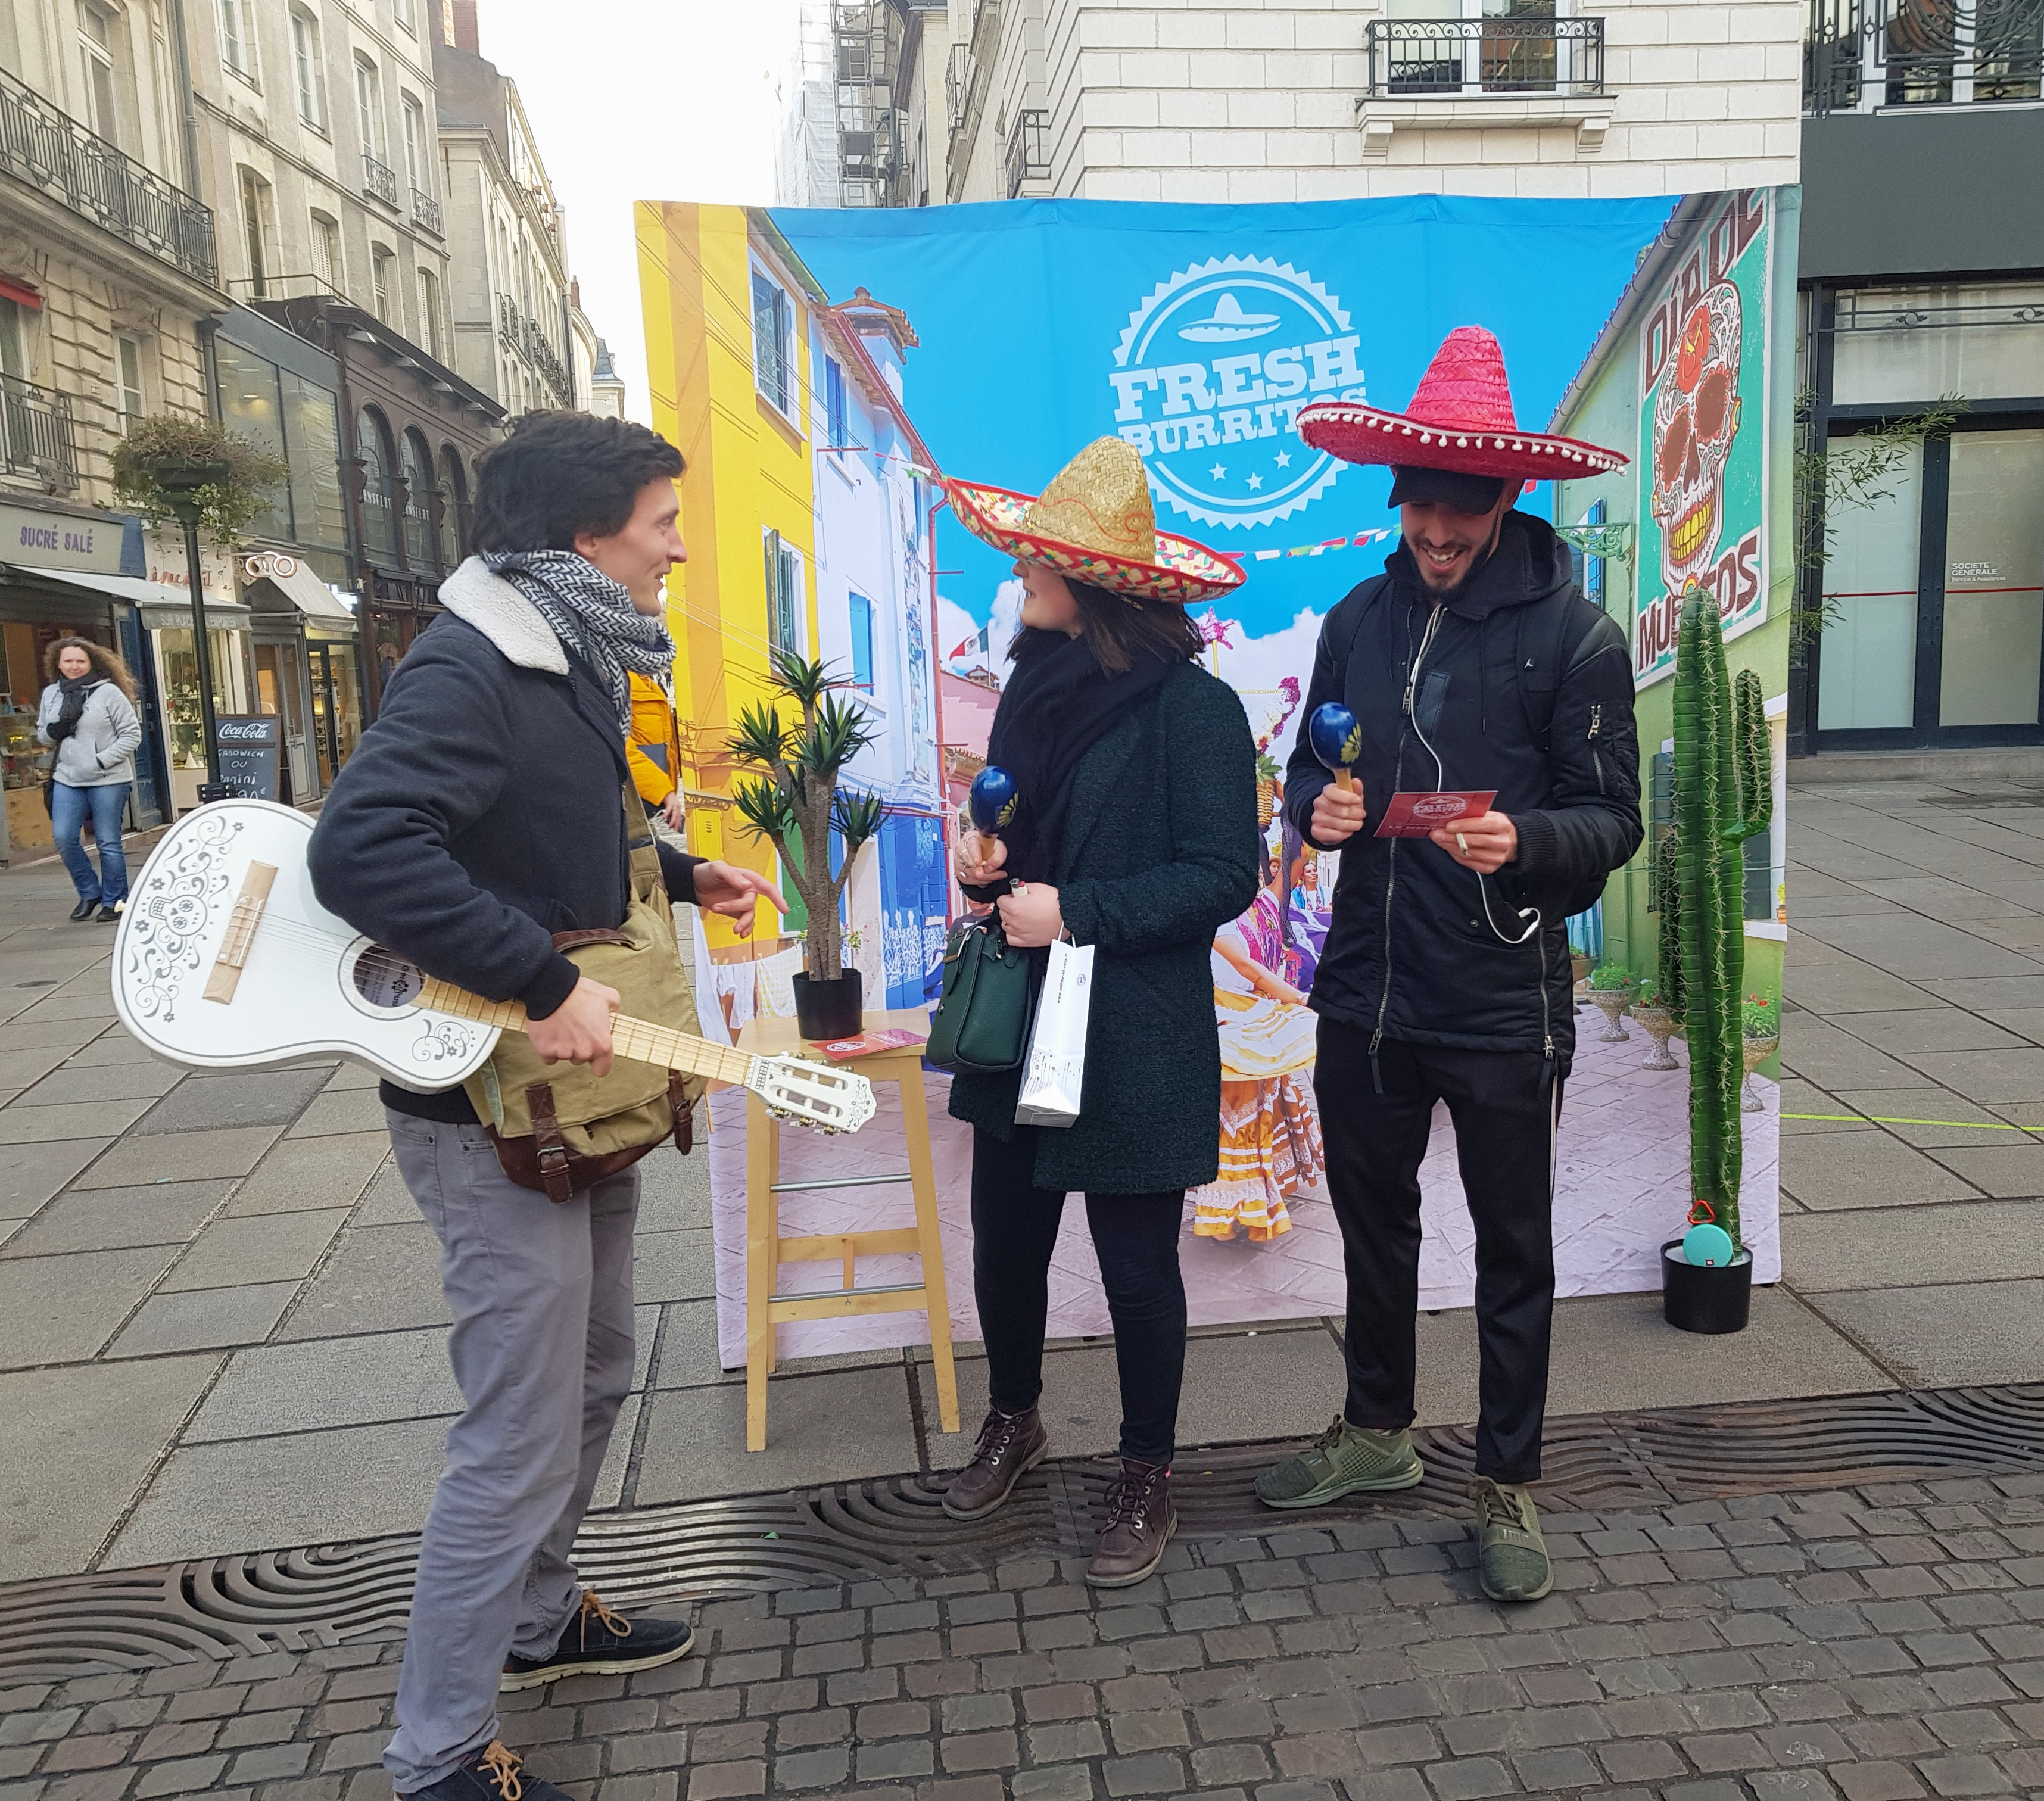 Street Marketing Fresh Burritos